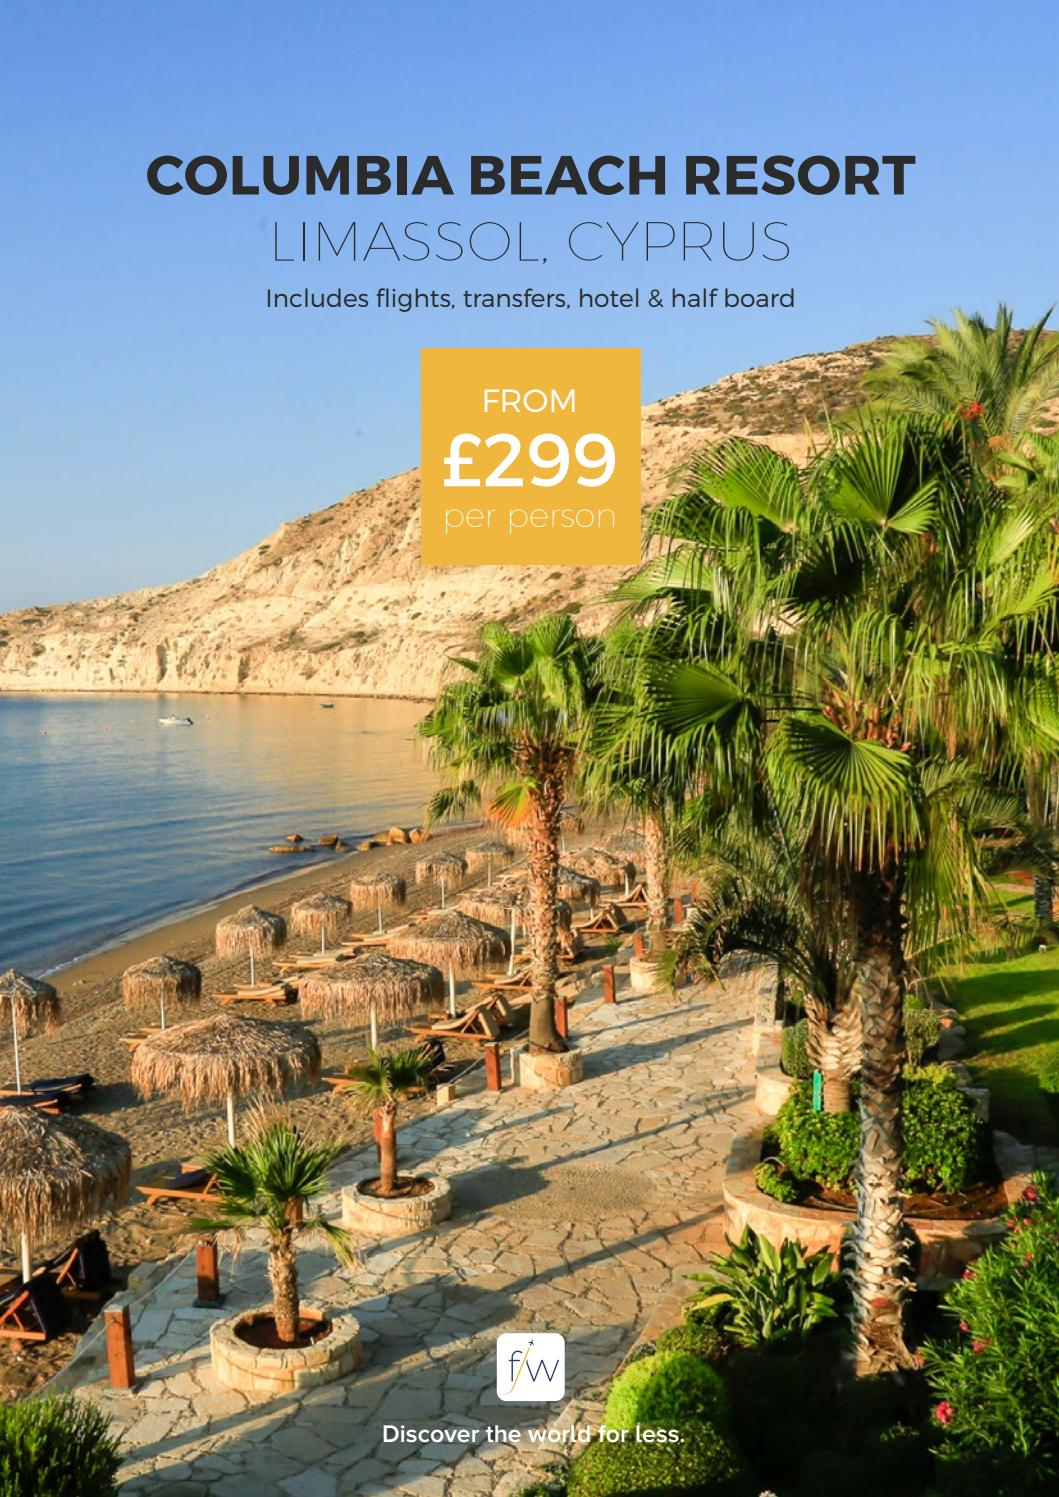 9500 Miramar Rd: Columbia Beach Resort, Limassol, Cyprus By Fleetway